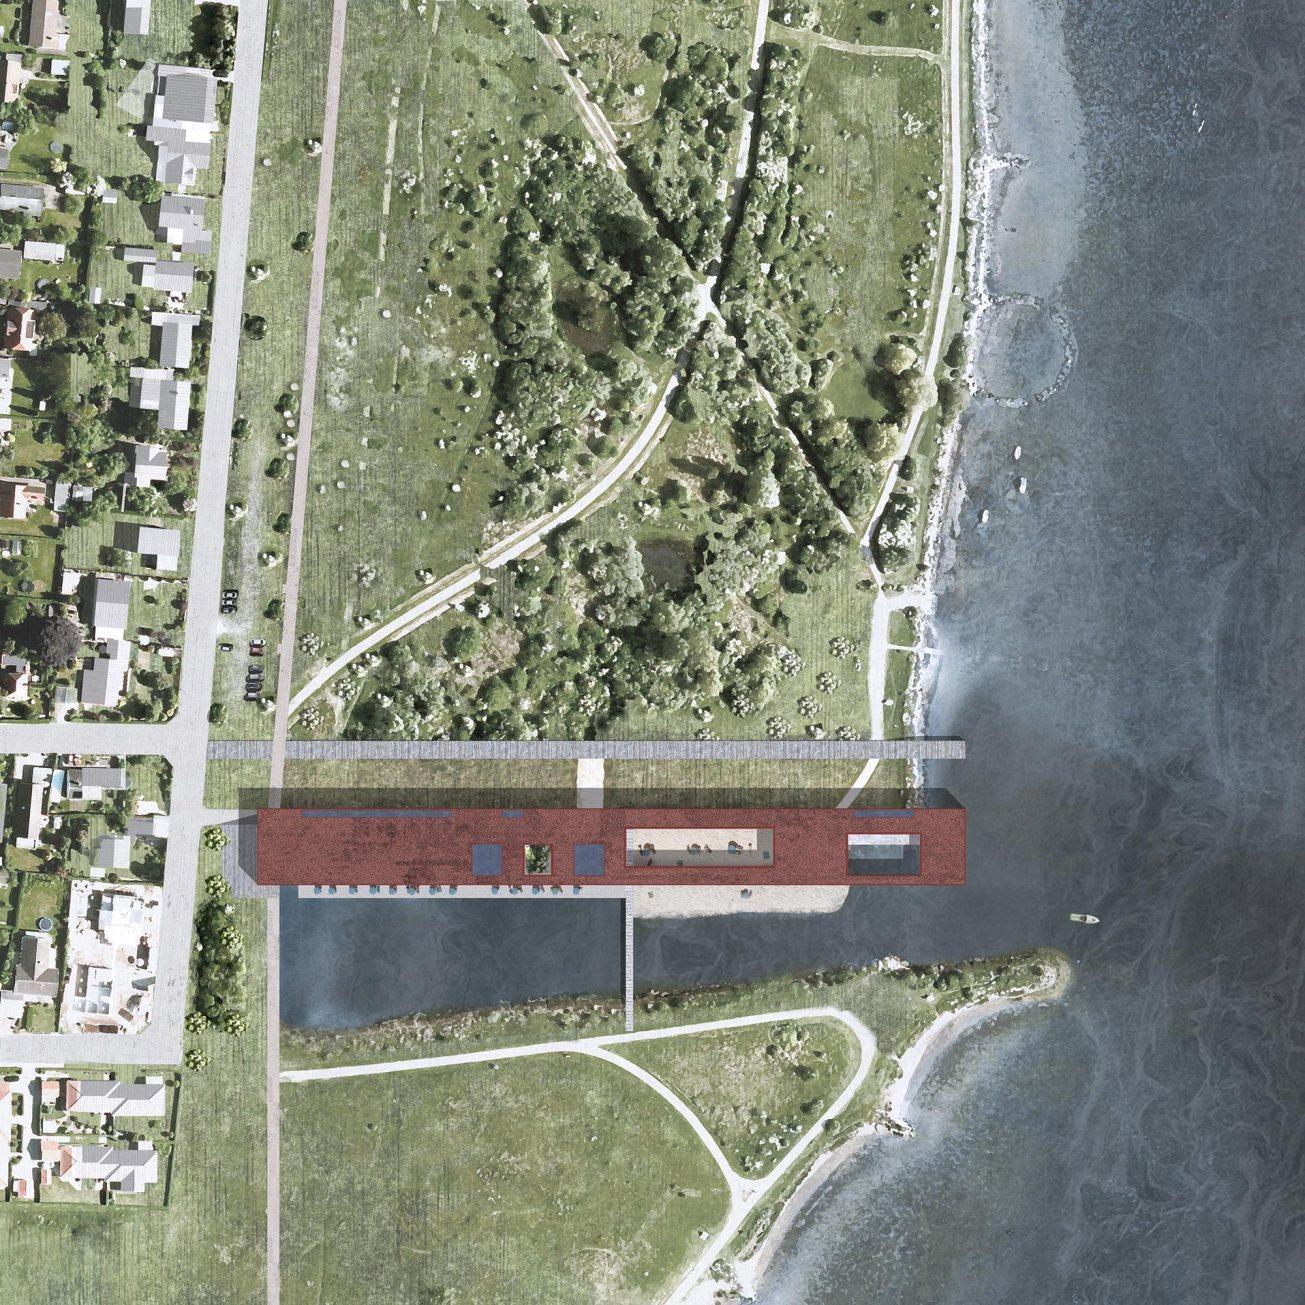 kystagerparken-plan-masse